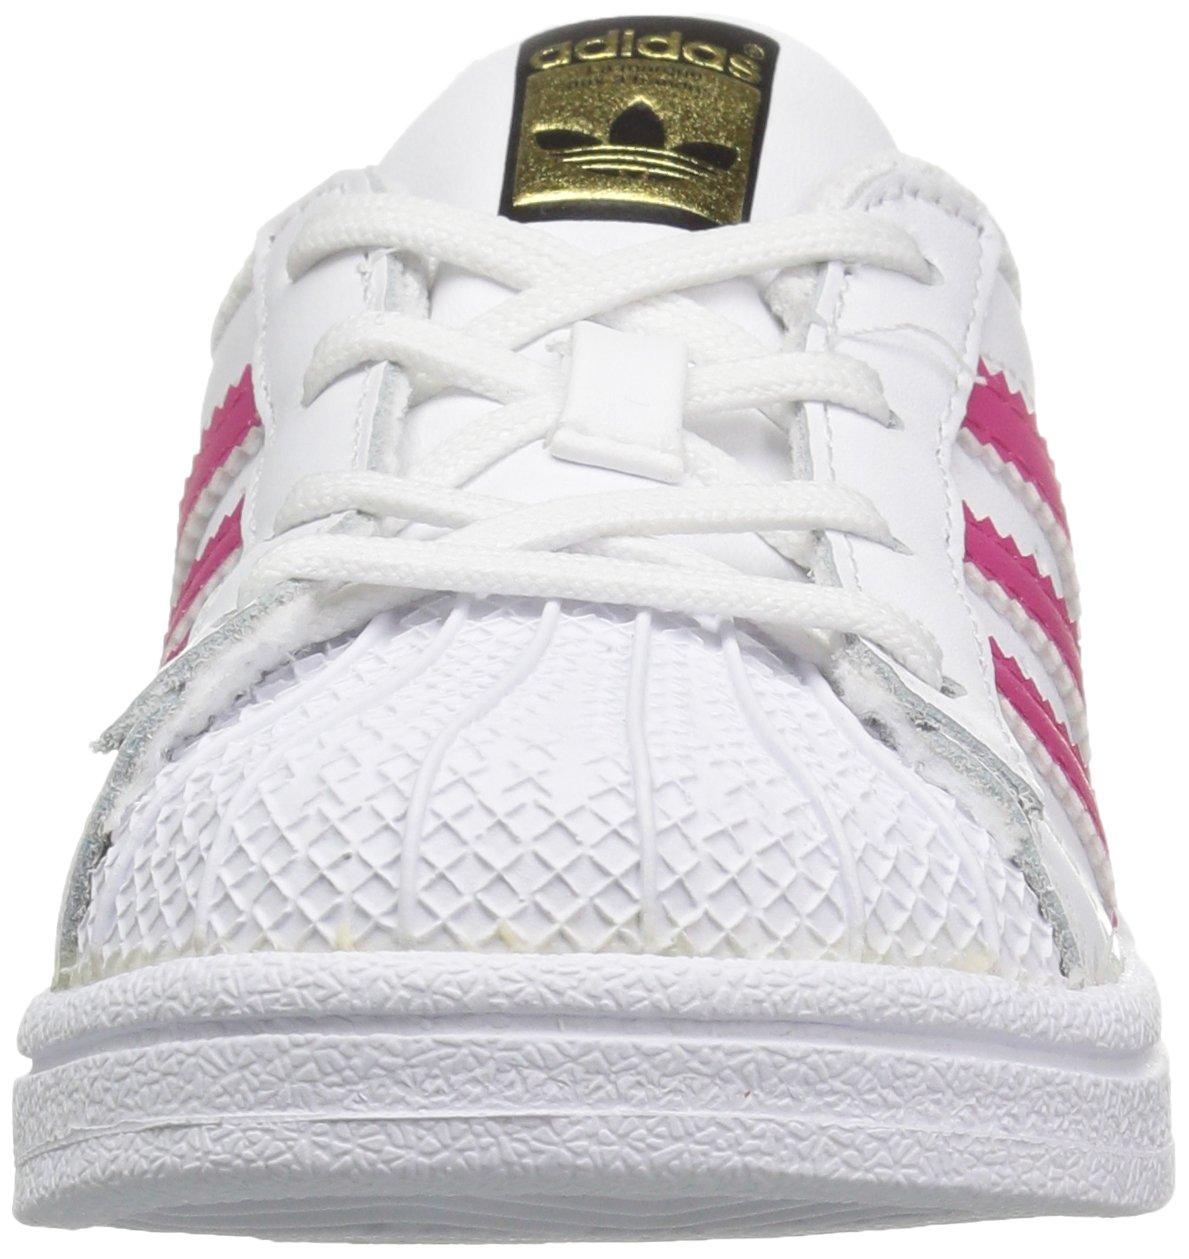 adidas superstar scarpe bianco b01dz15gay scarpe figli bambini / audace